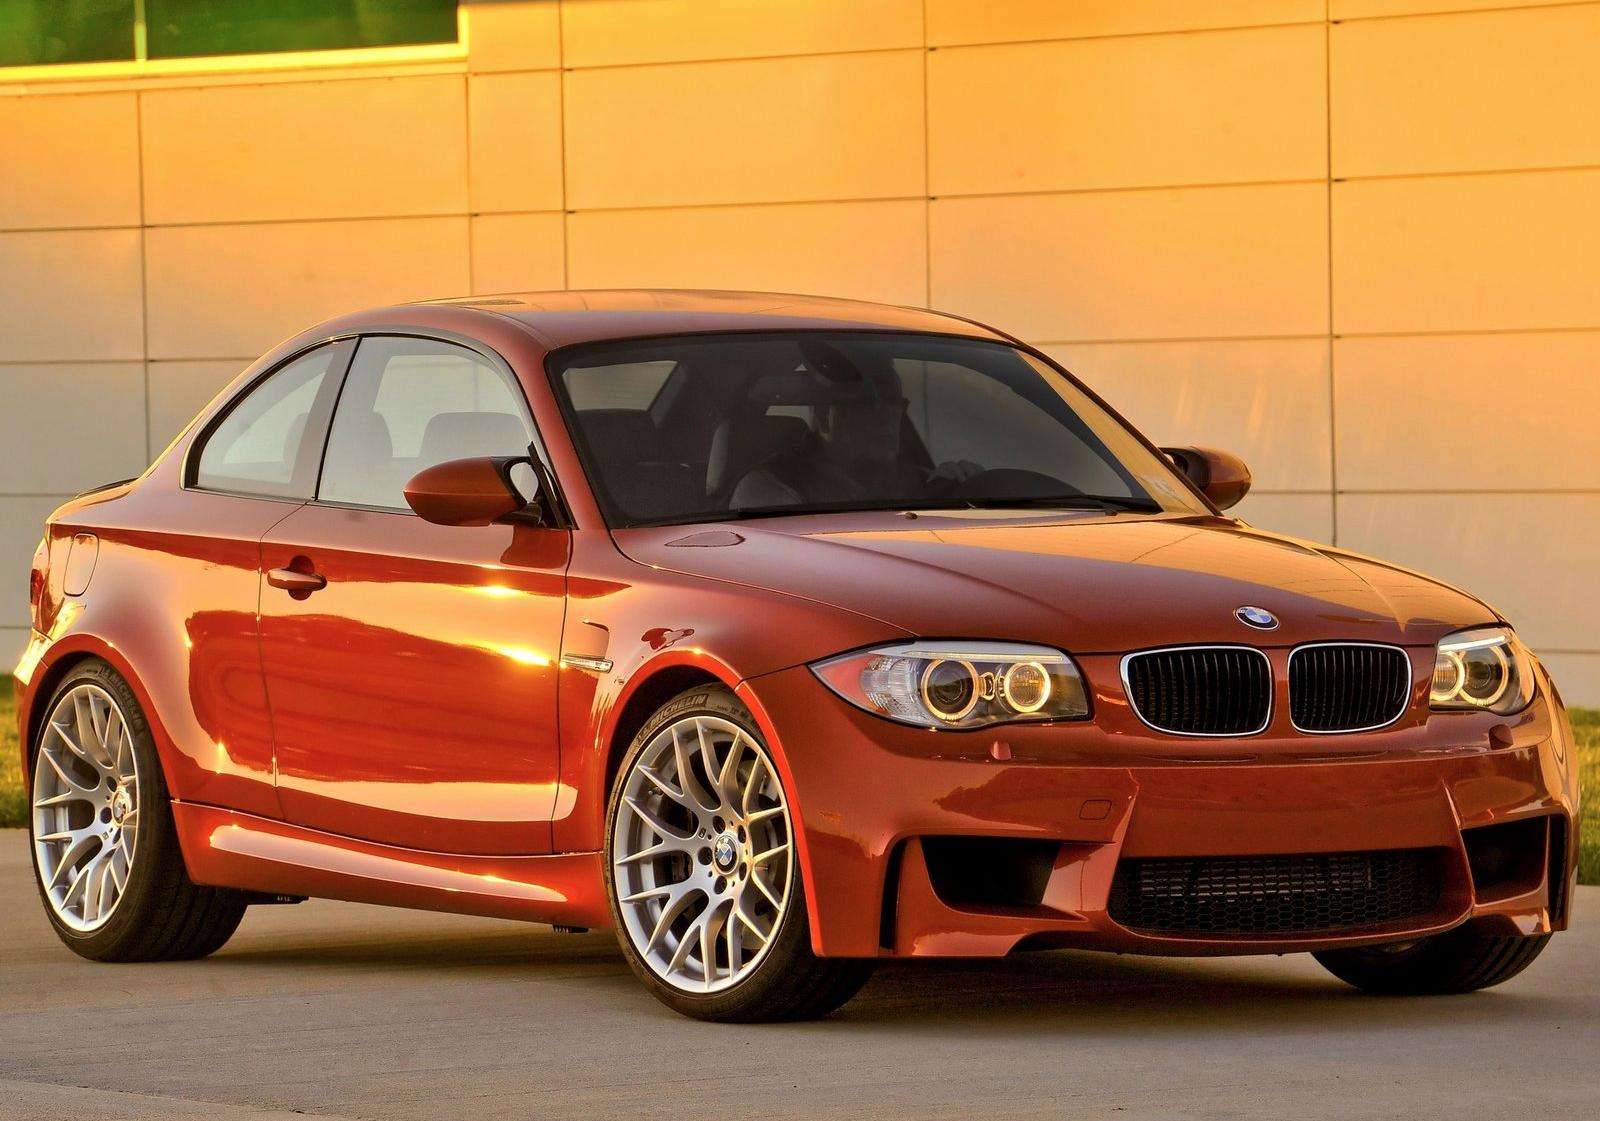 BMW 1M I (E82) 2011 - now Coupe #1